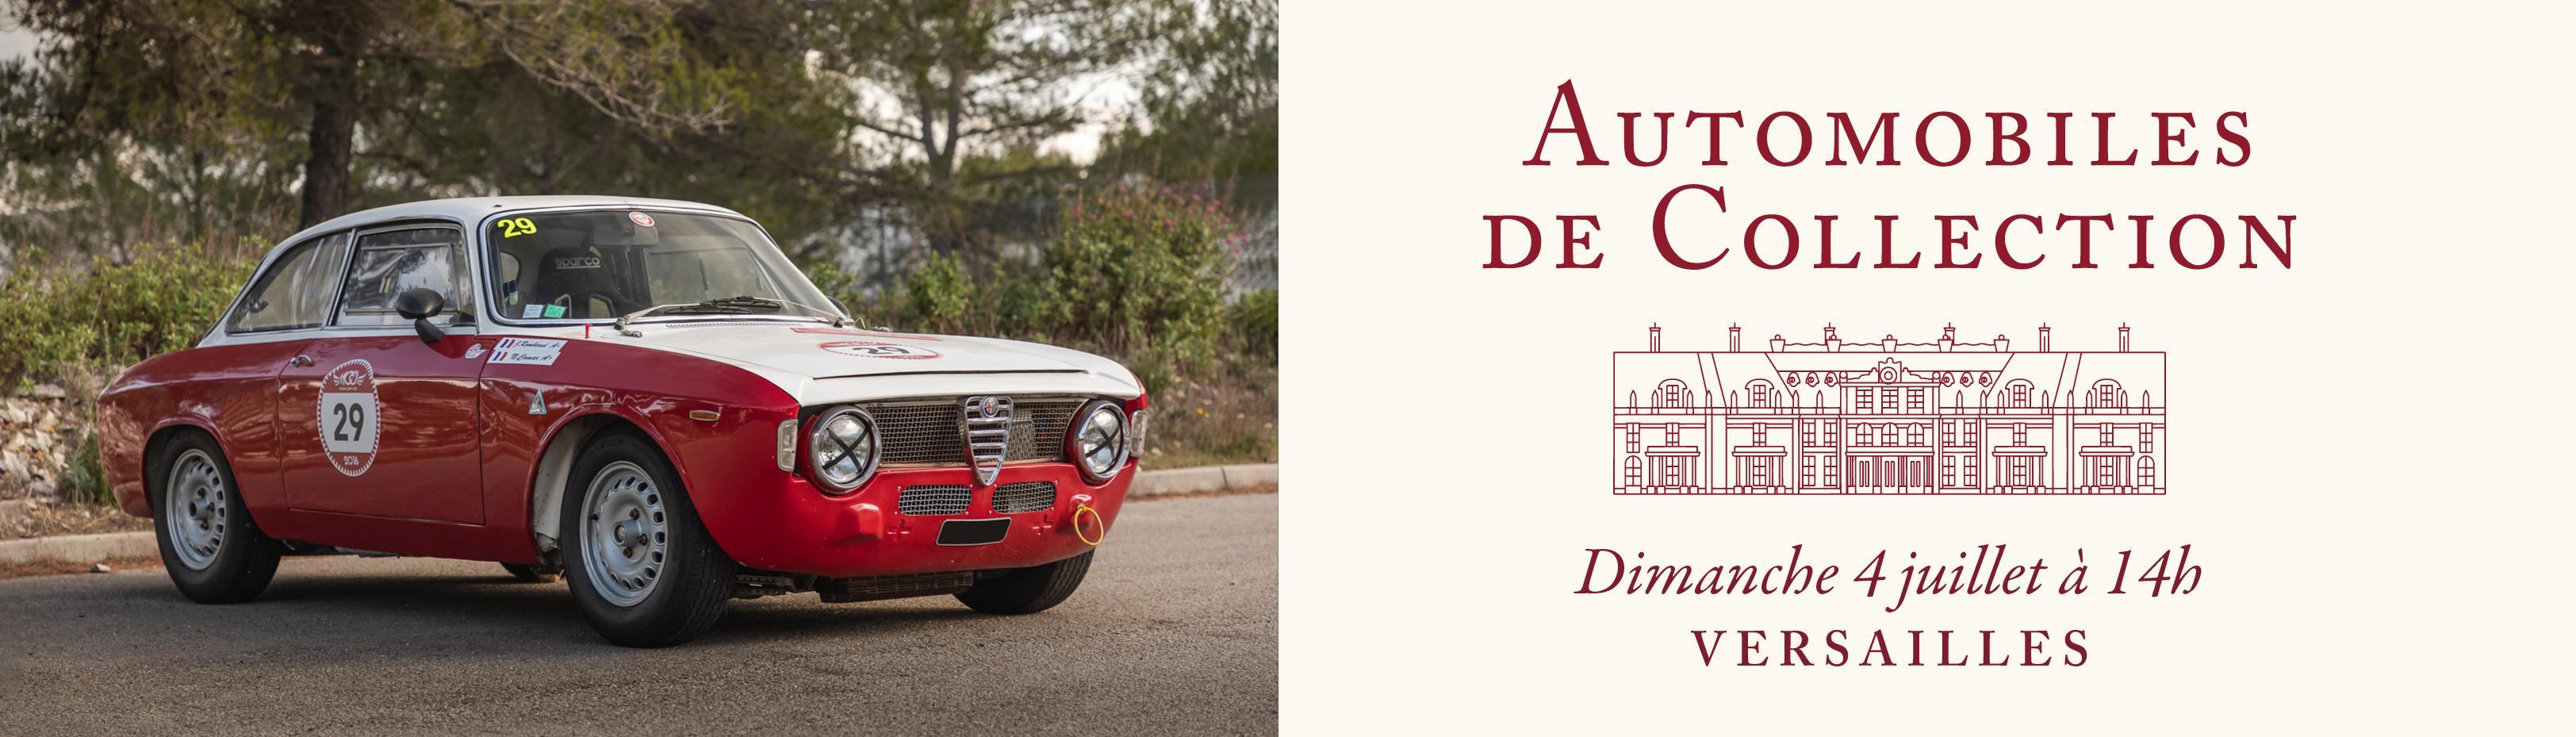 Automobiles de Collection - Versailles